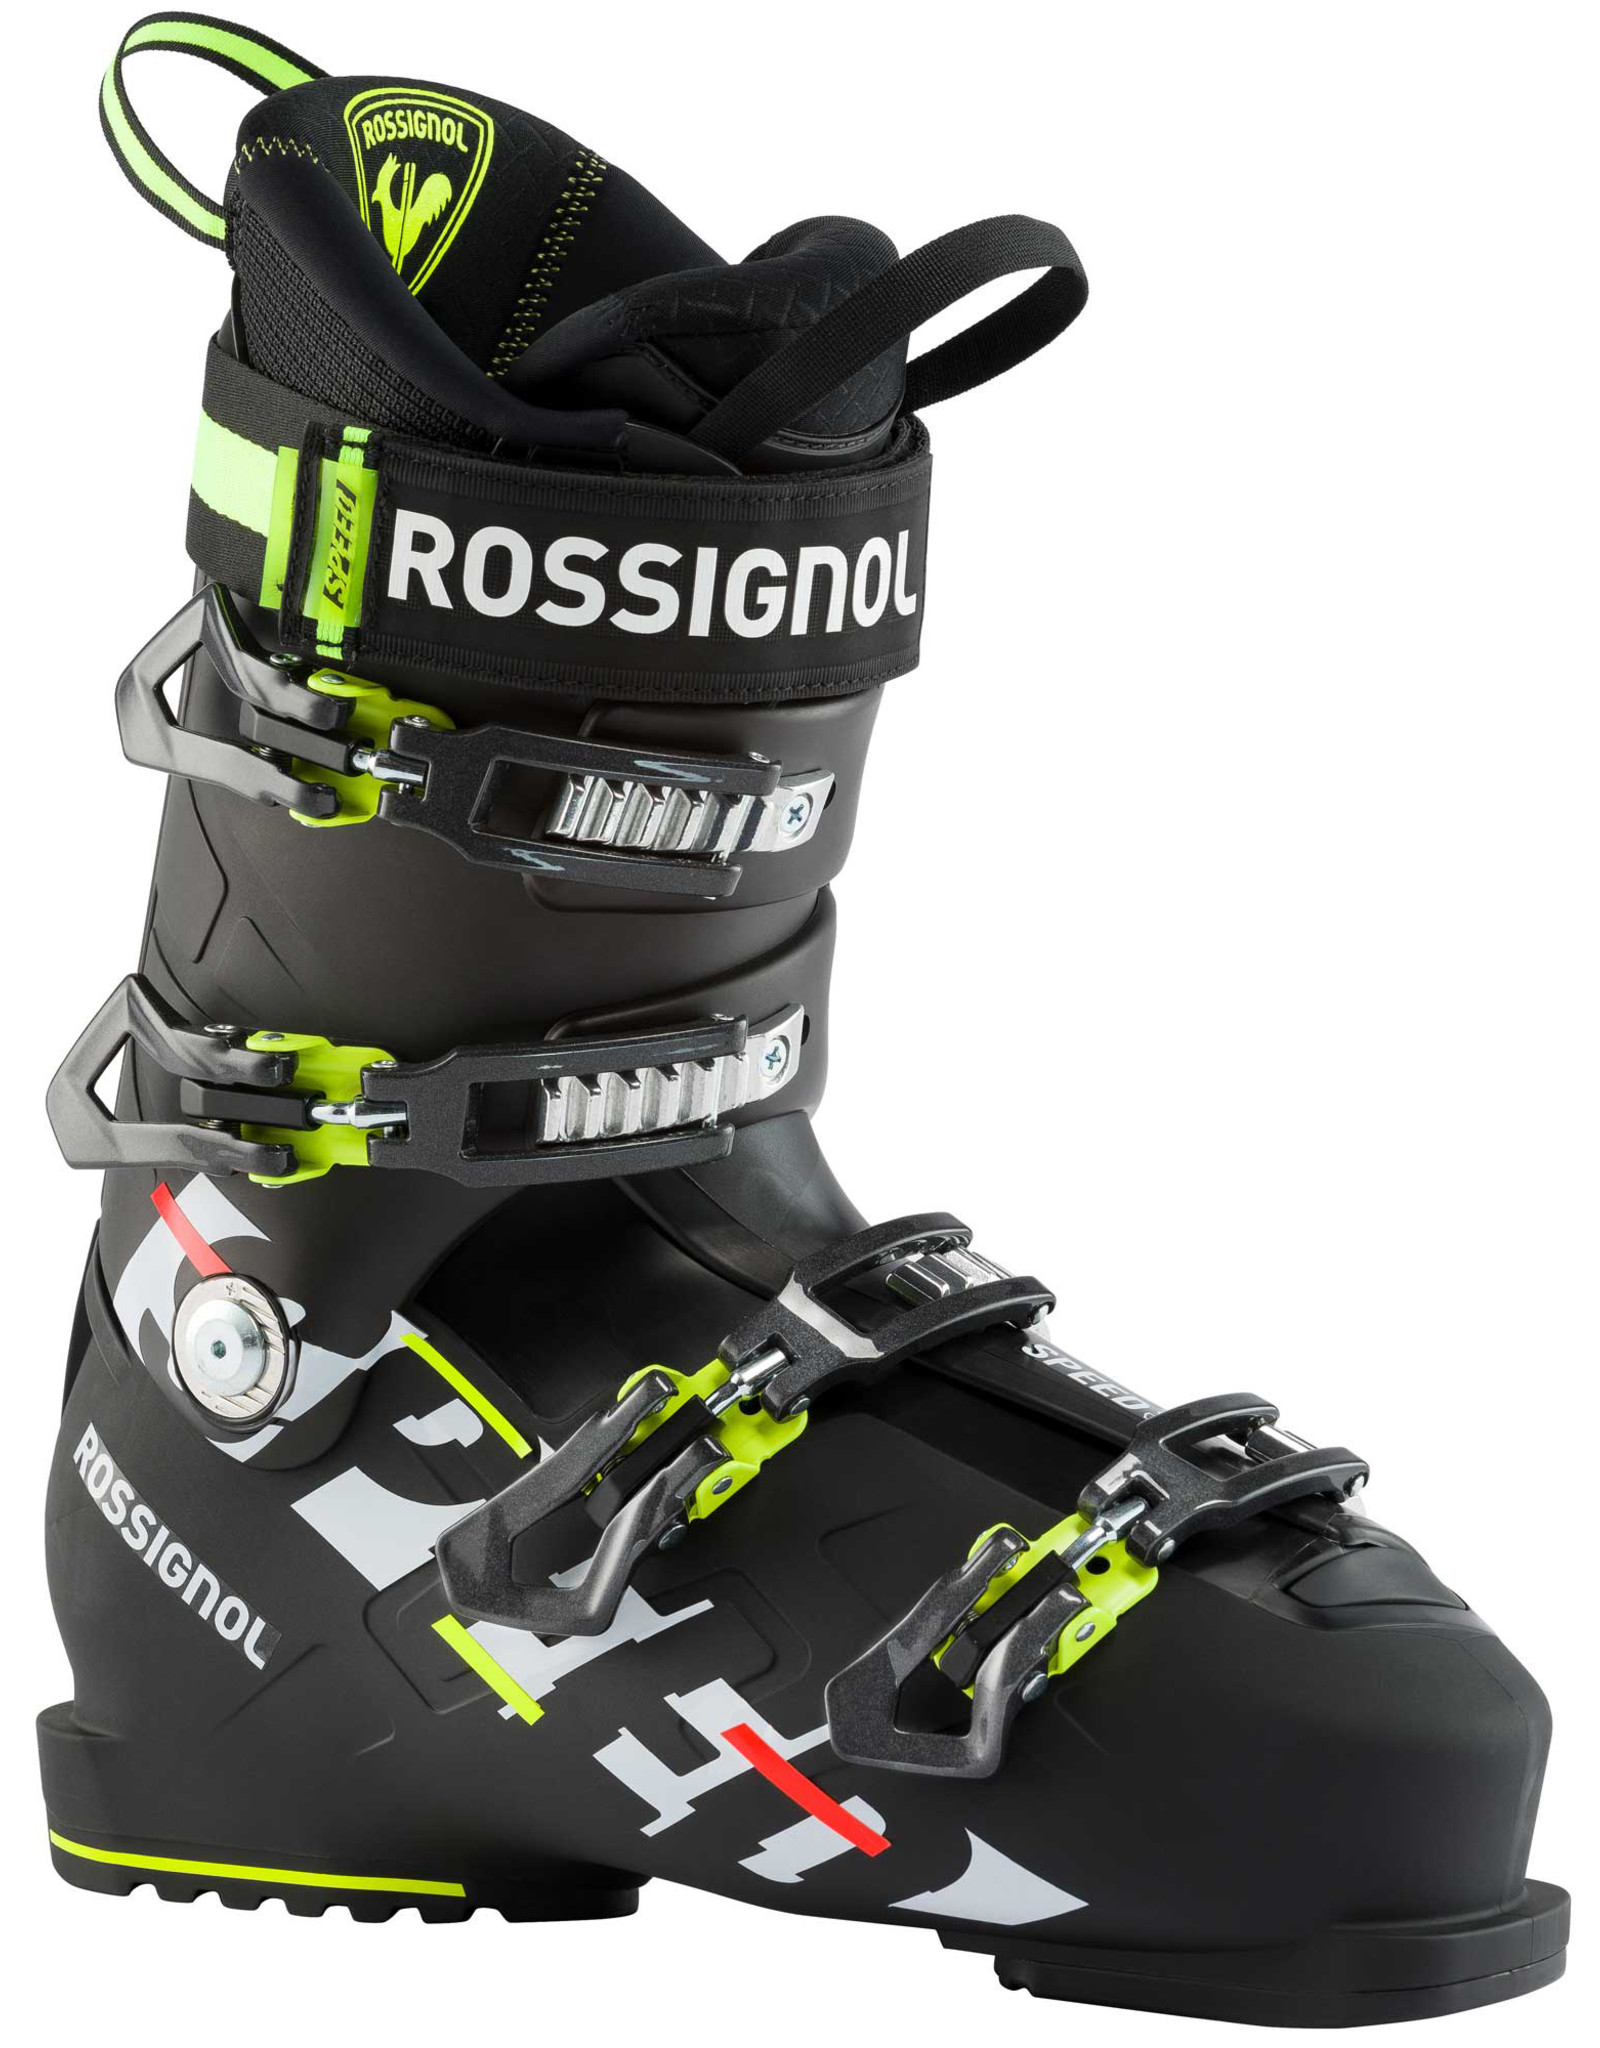 Rossignol SPEED 100 - BLACK